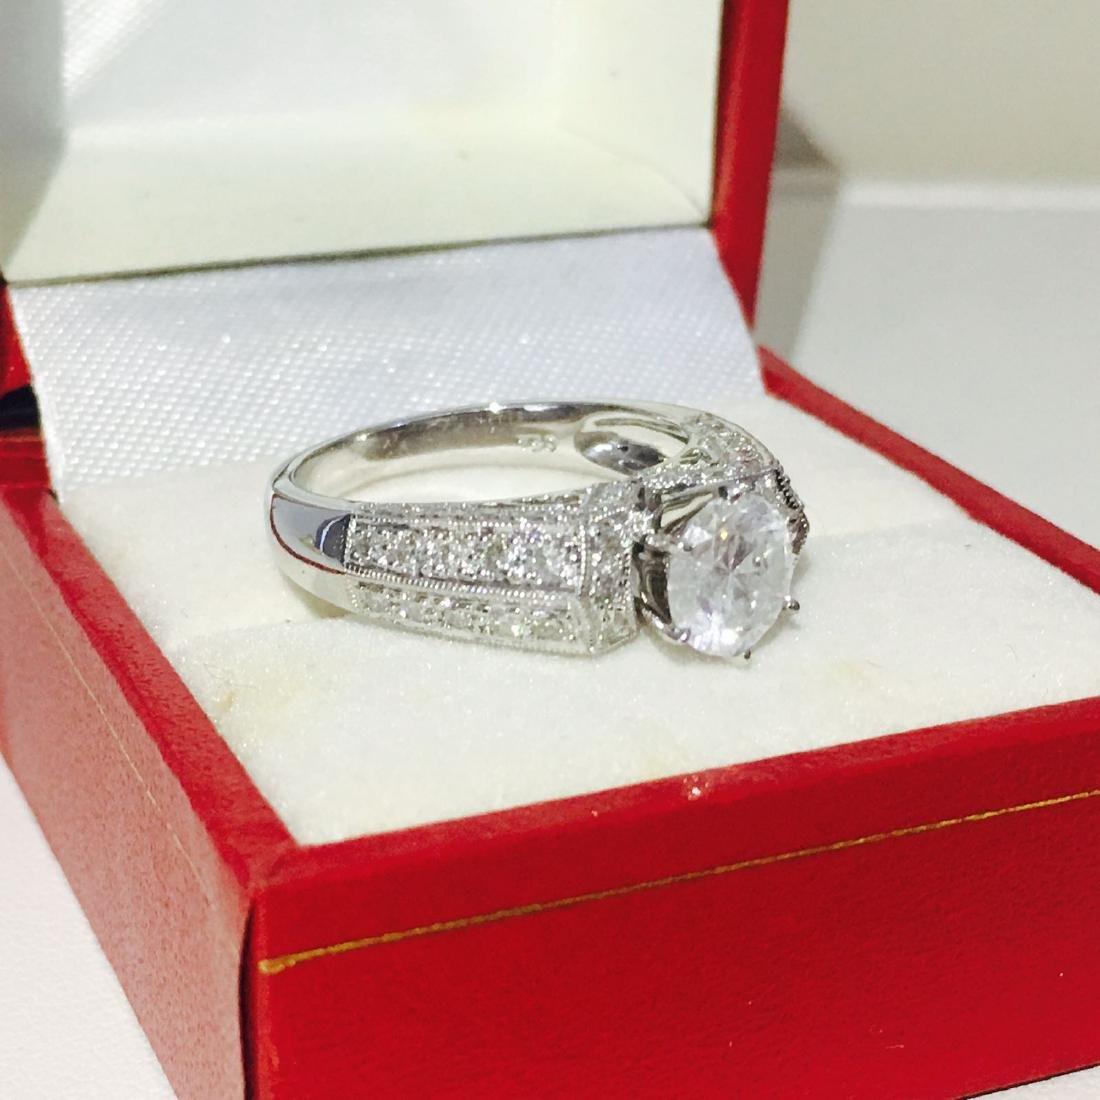 18K White Gold, 2.10 CT Diamond Engagement Ring - 6